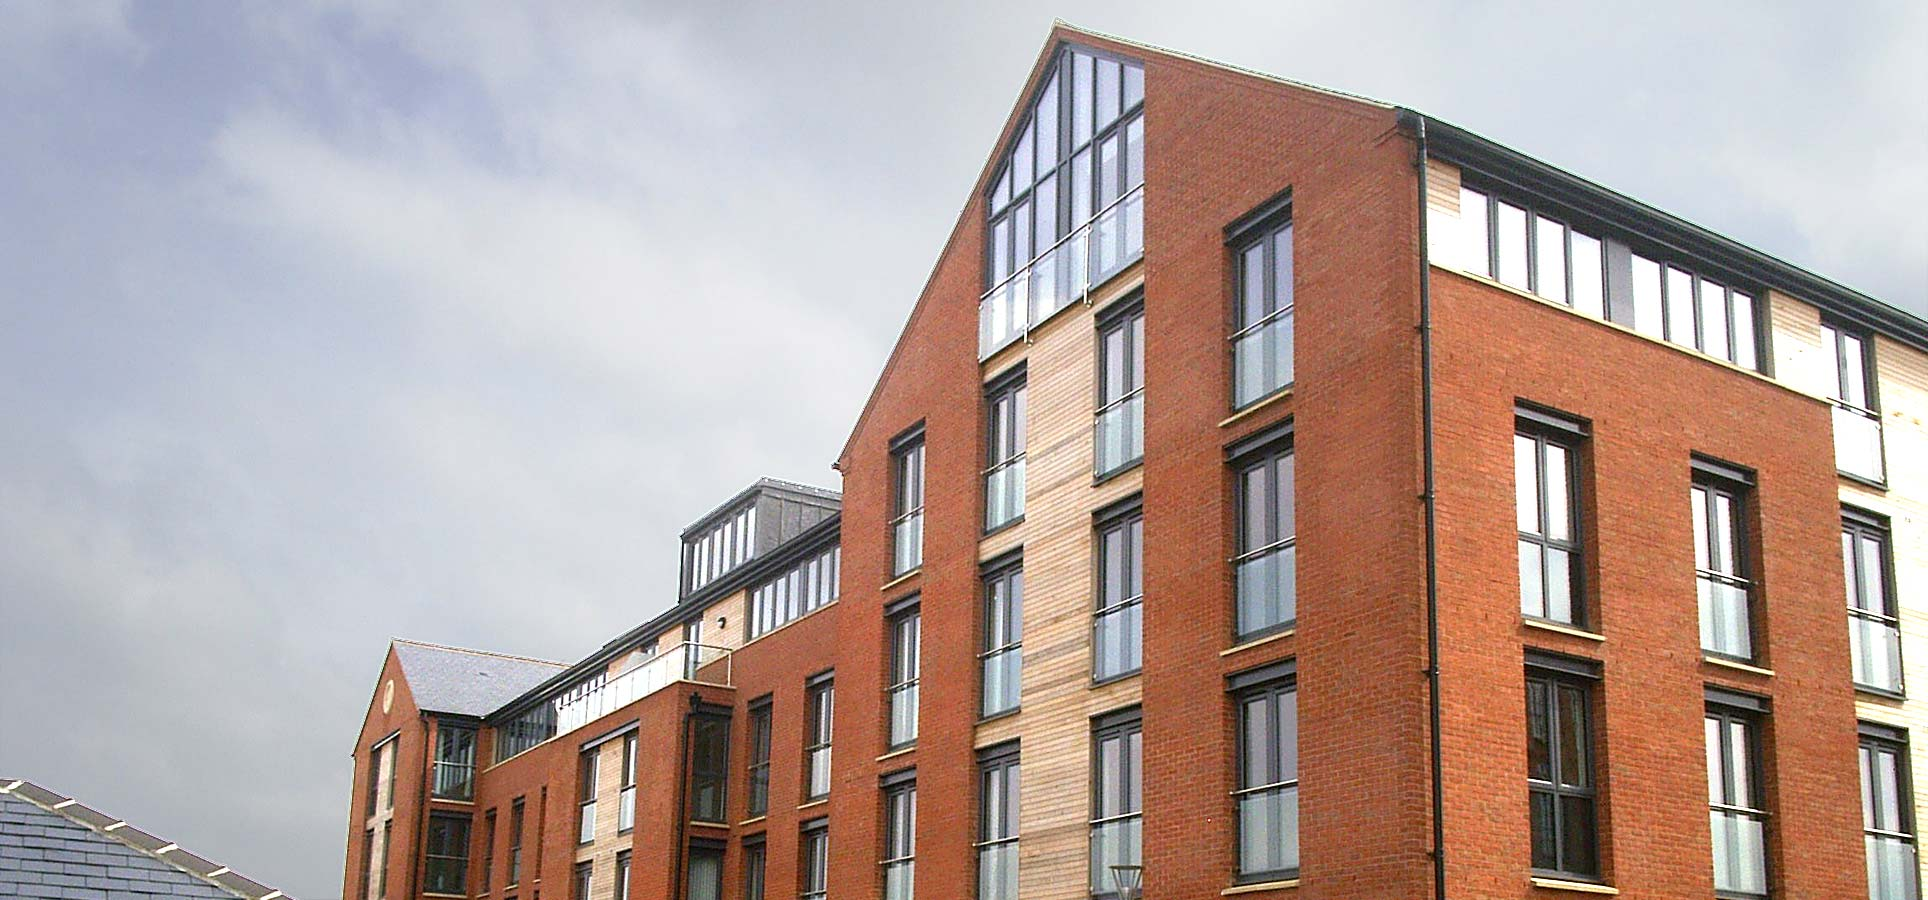 Anglo Scotian Mills, Beeston, Jessops Construction Ltd